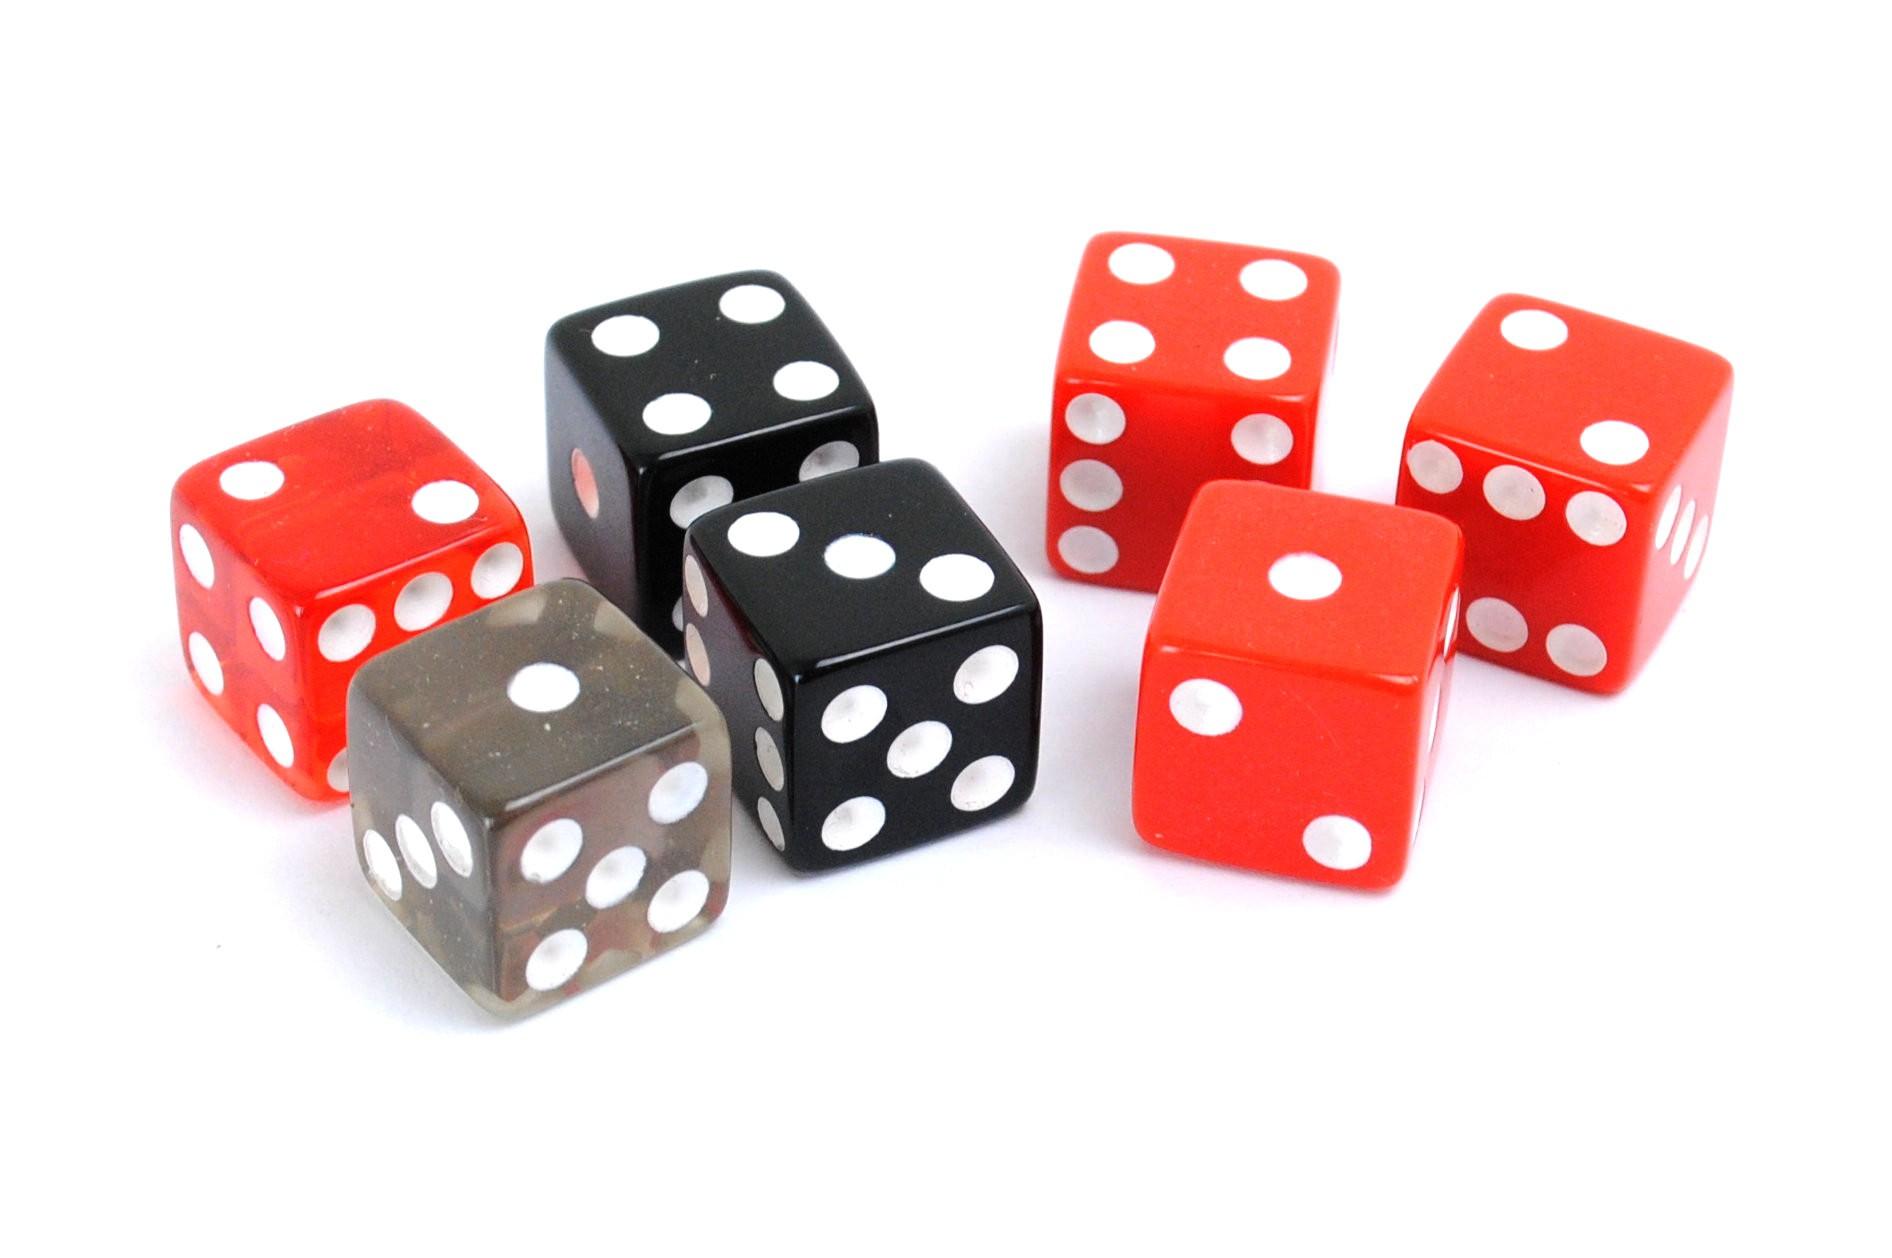 Craps-Würfel / Casino-Würfel